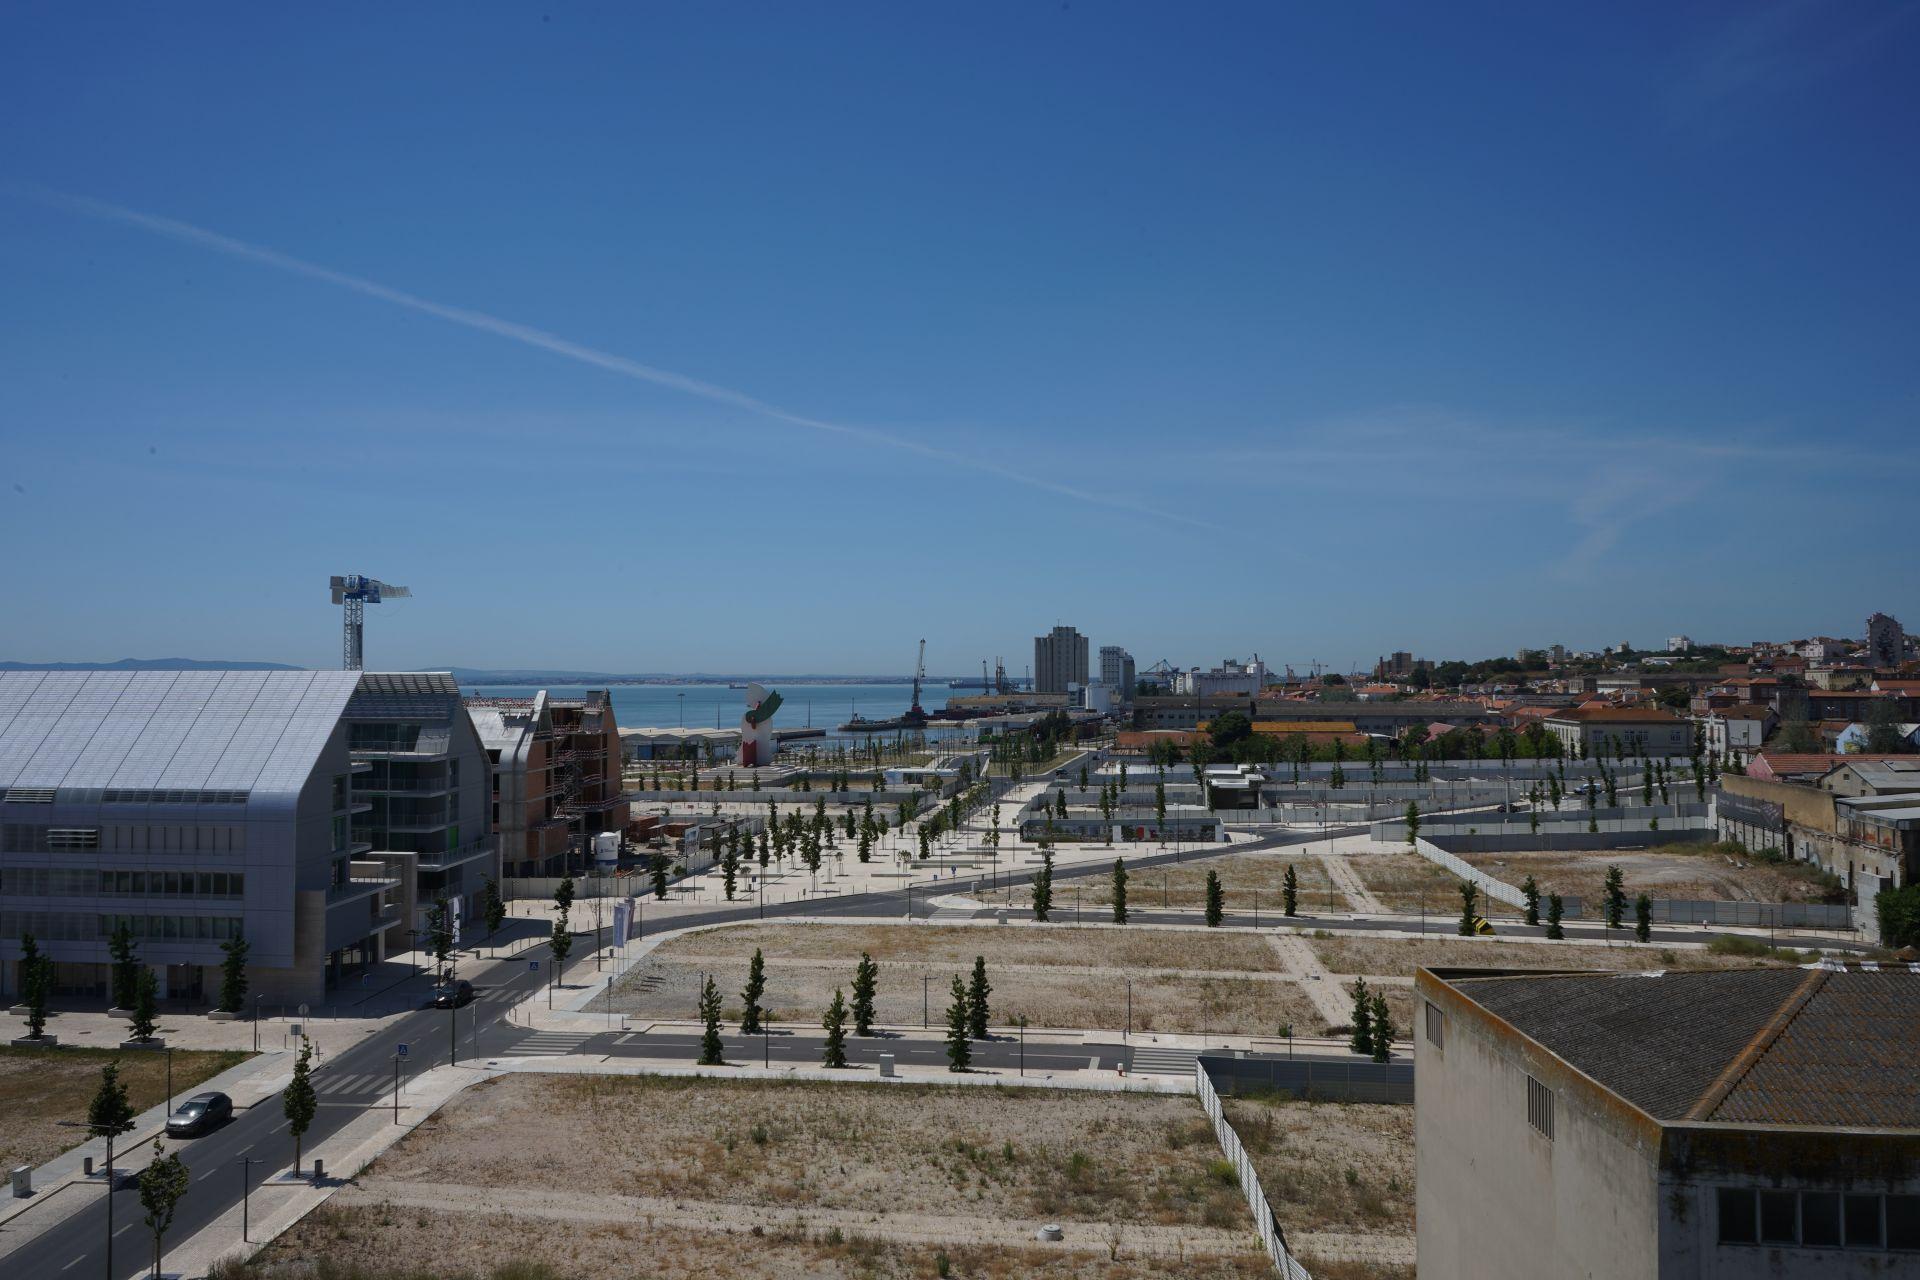 Nkoowoork, Lisbon